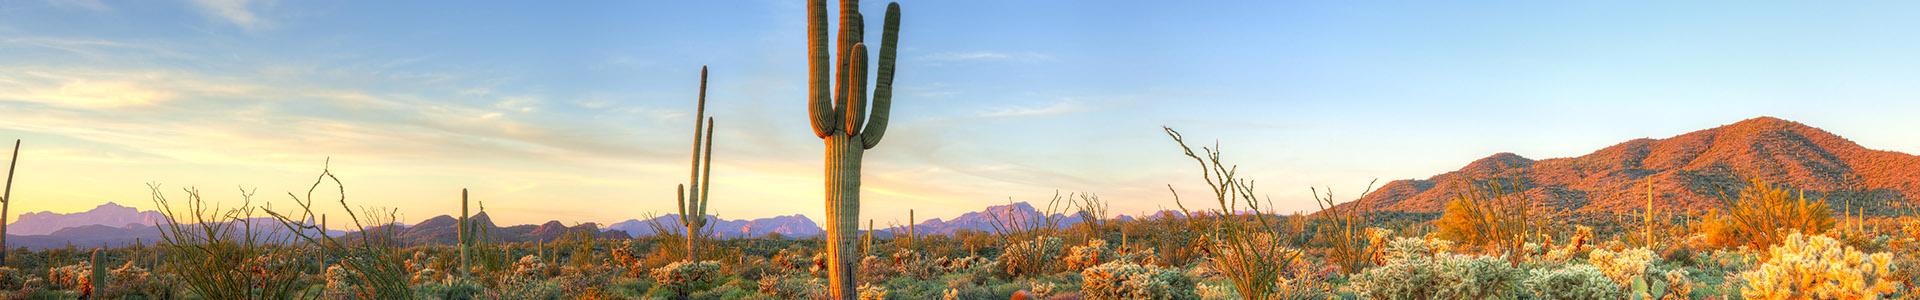 Arizona desert - Phoenix CyberKnife